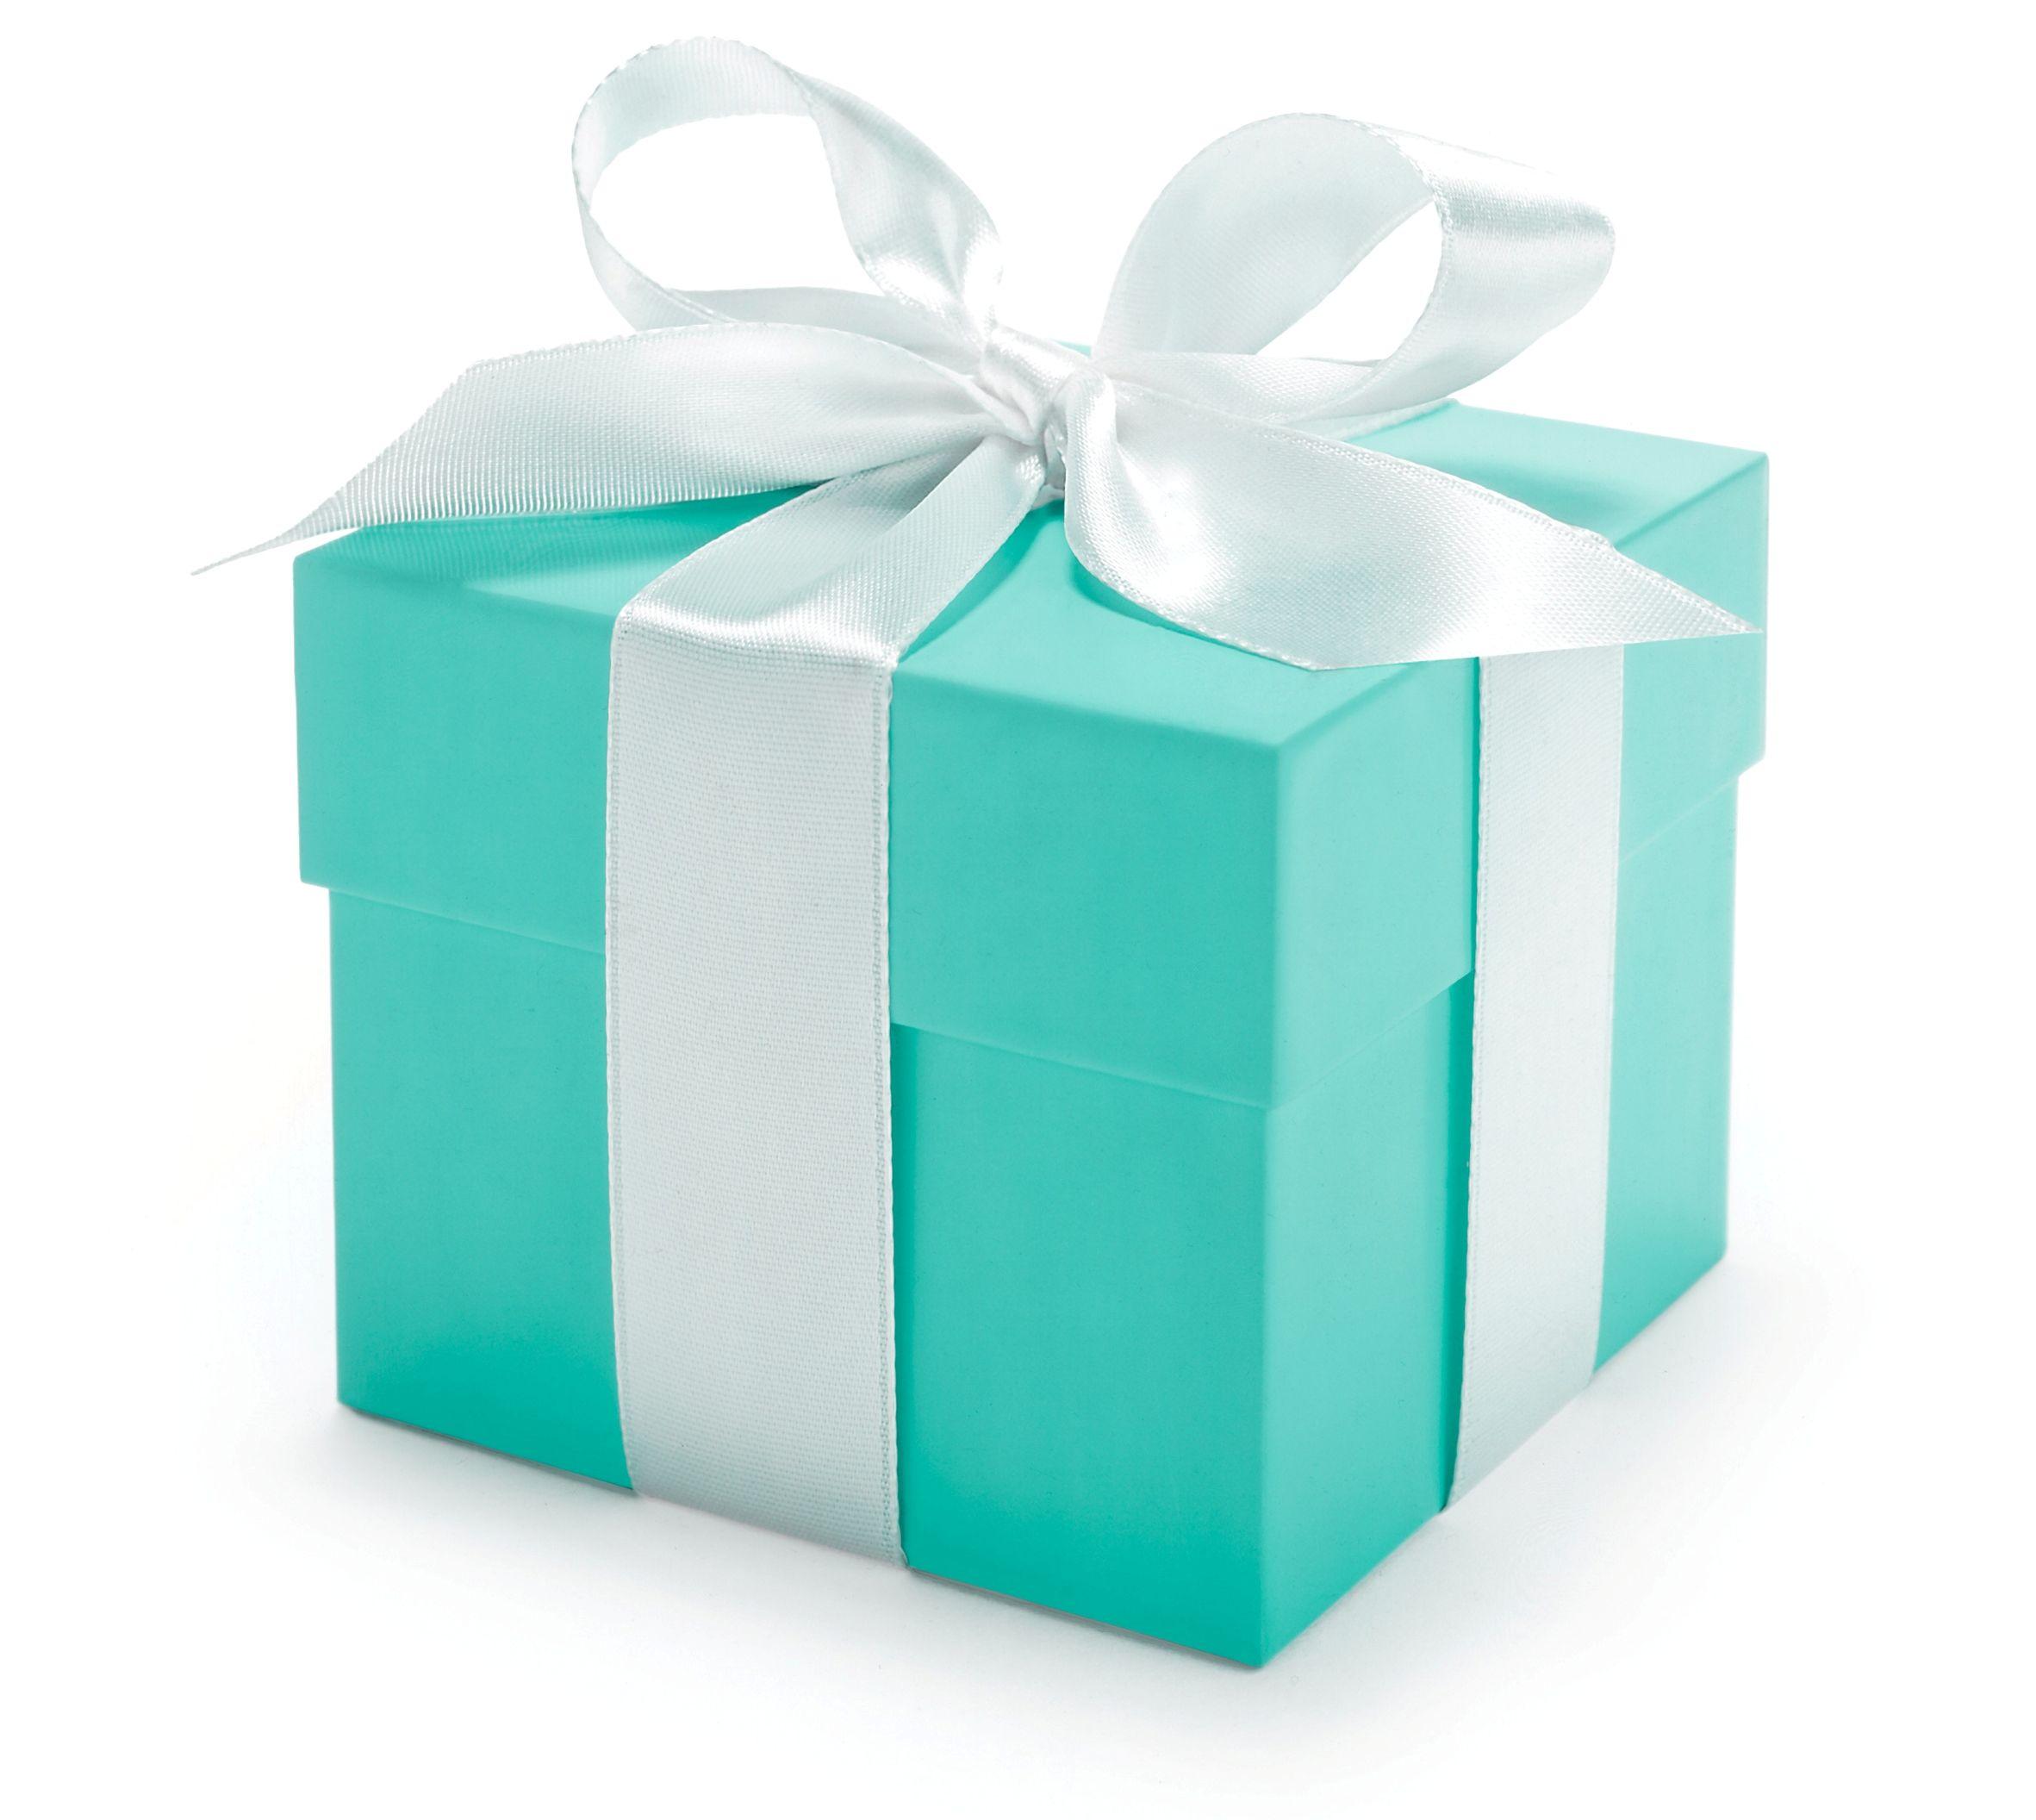 Tiffany & Co. | Products I Love | Pinterest